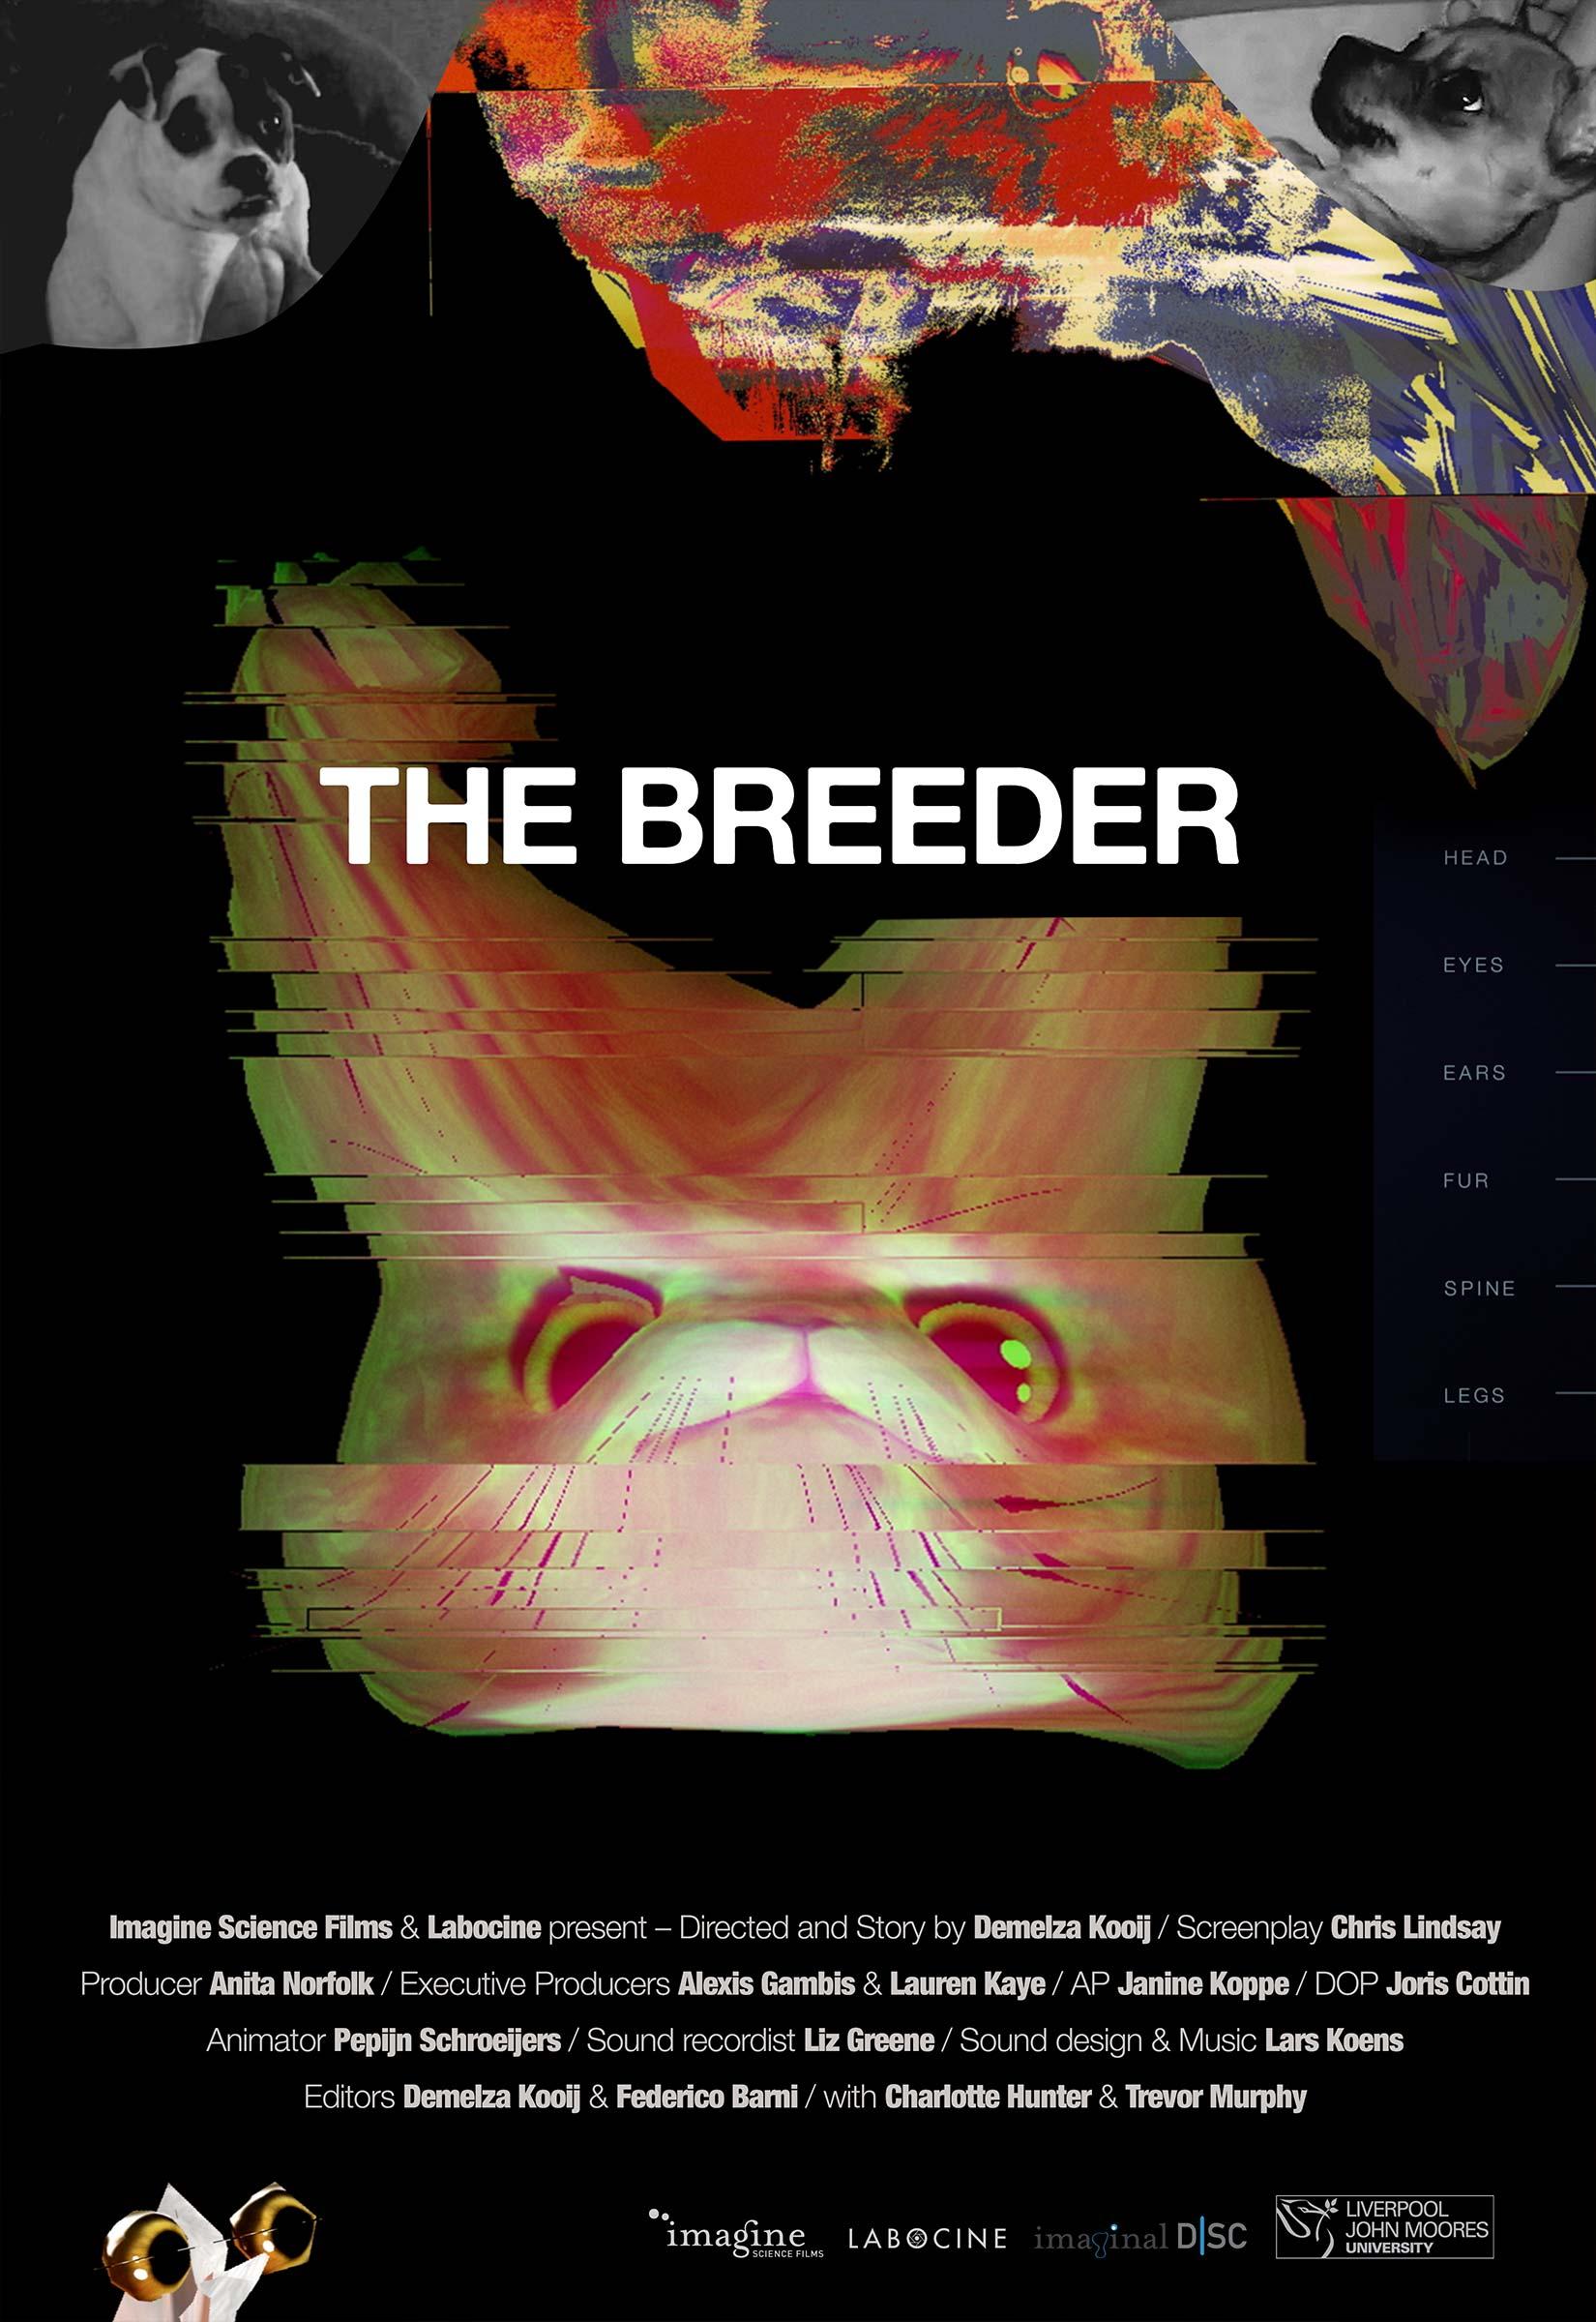 The_breeder_poster_demelza_kooij (1).jpg